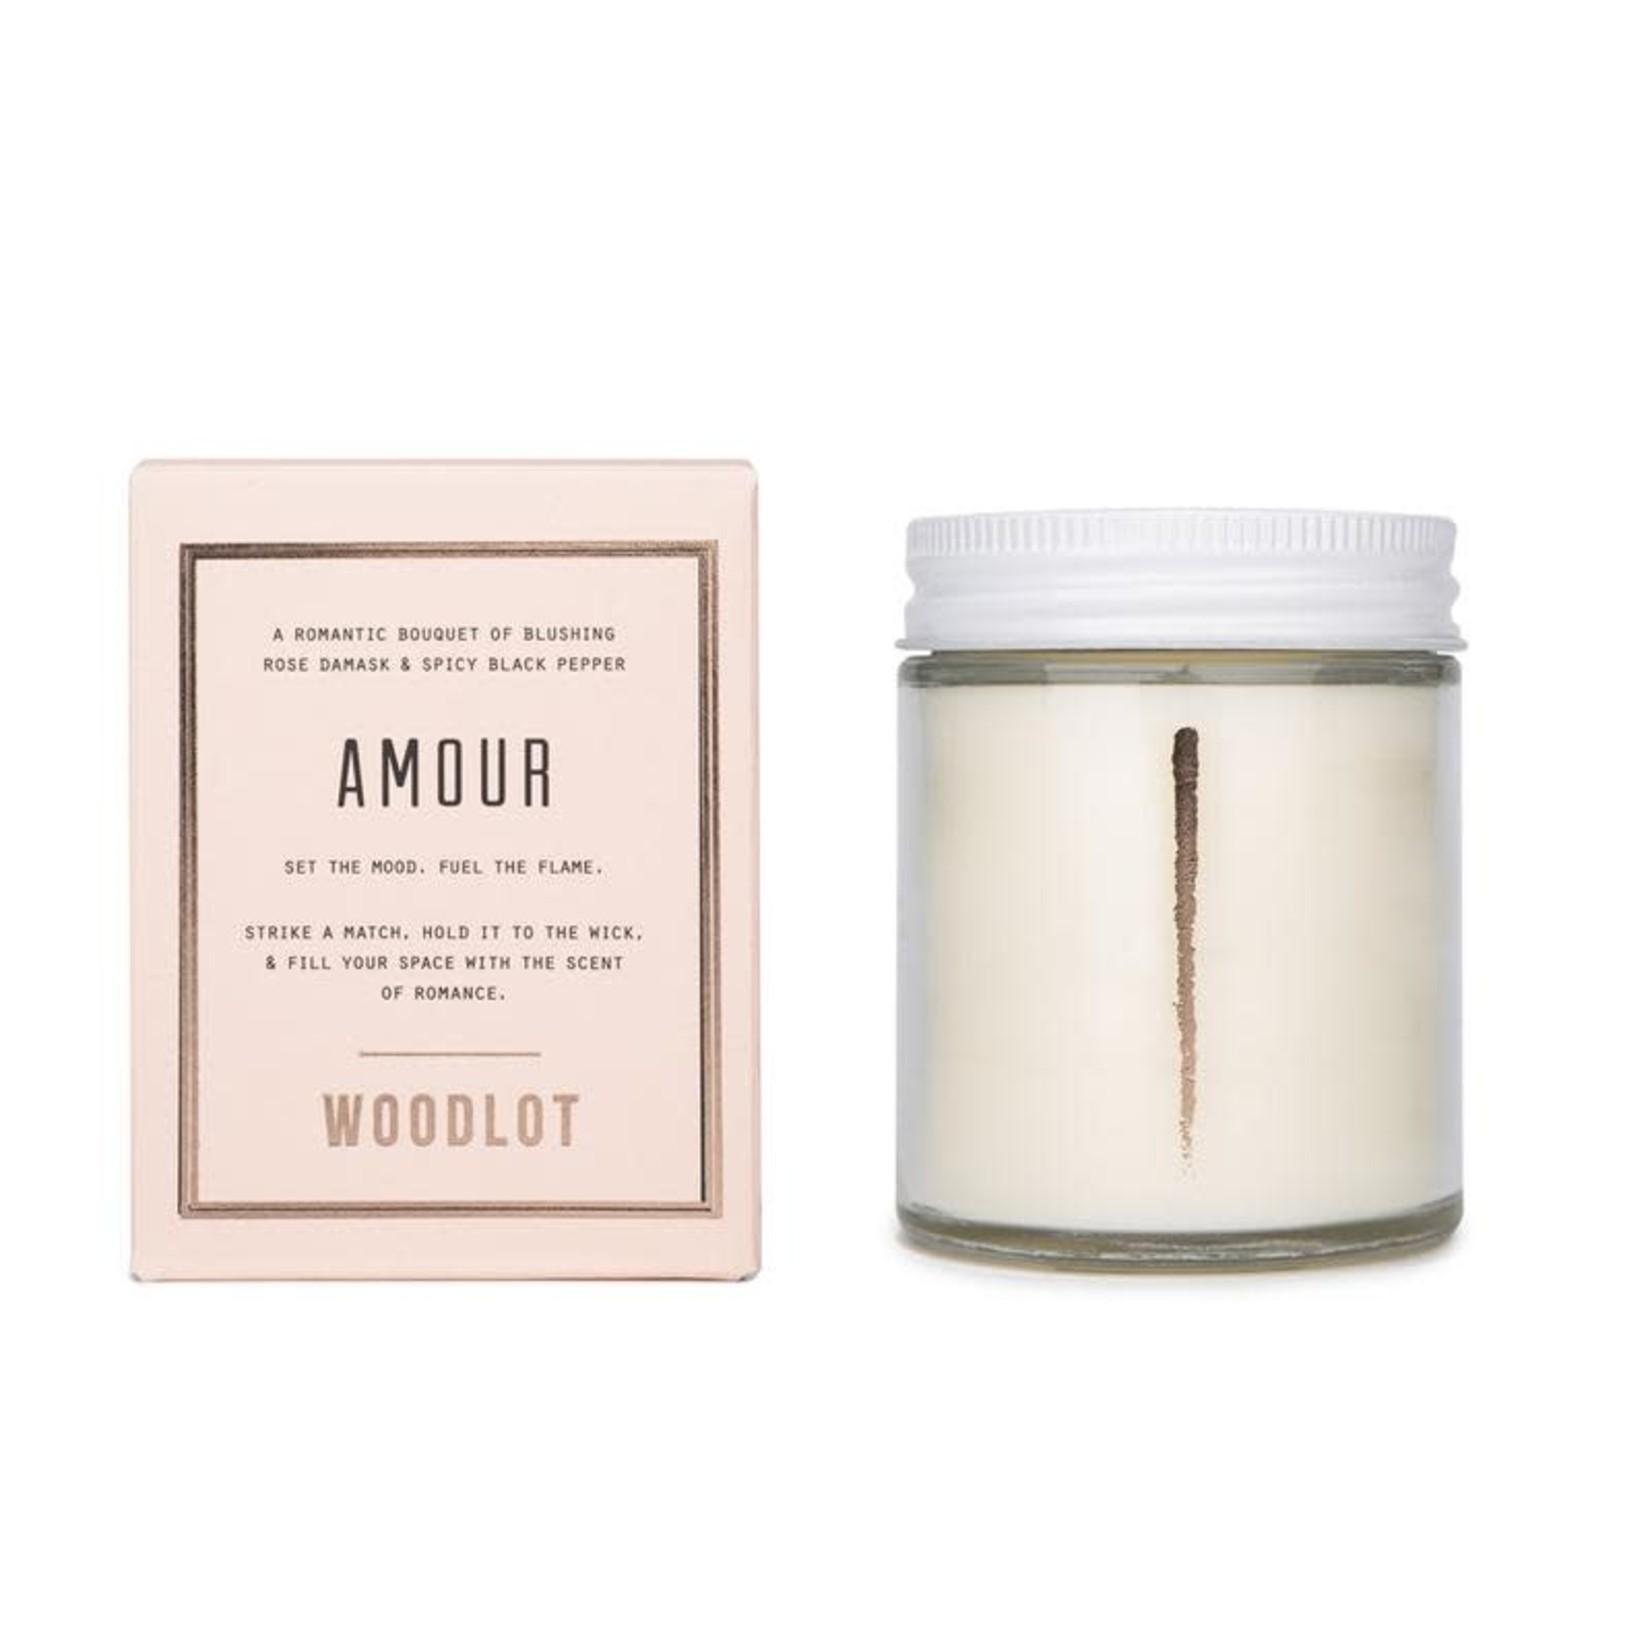 Woodlot Woodlot - bougie amour